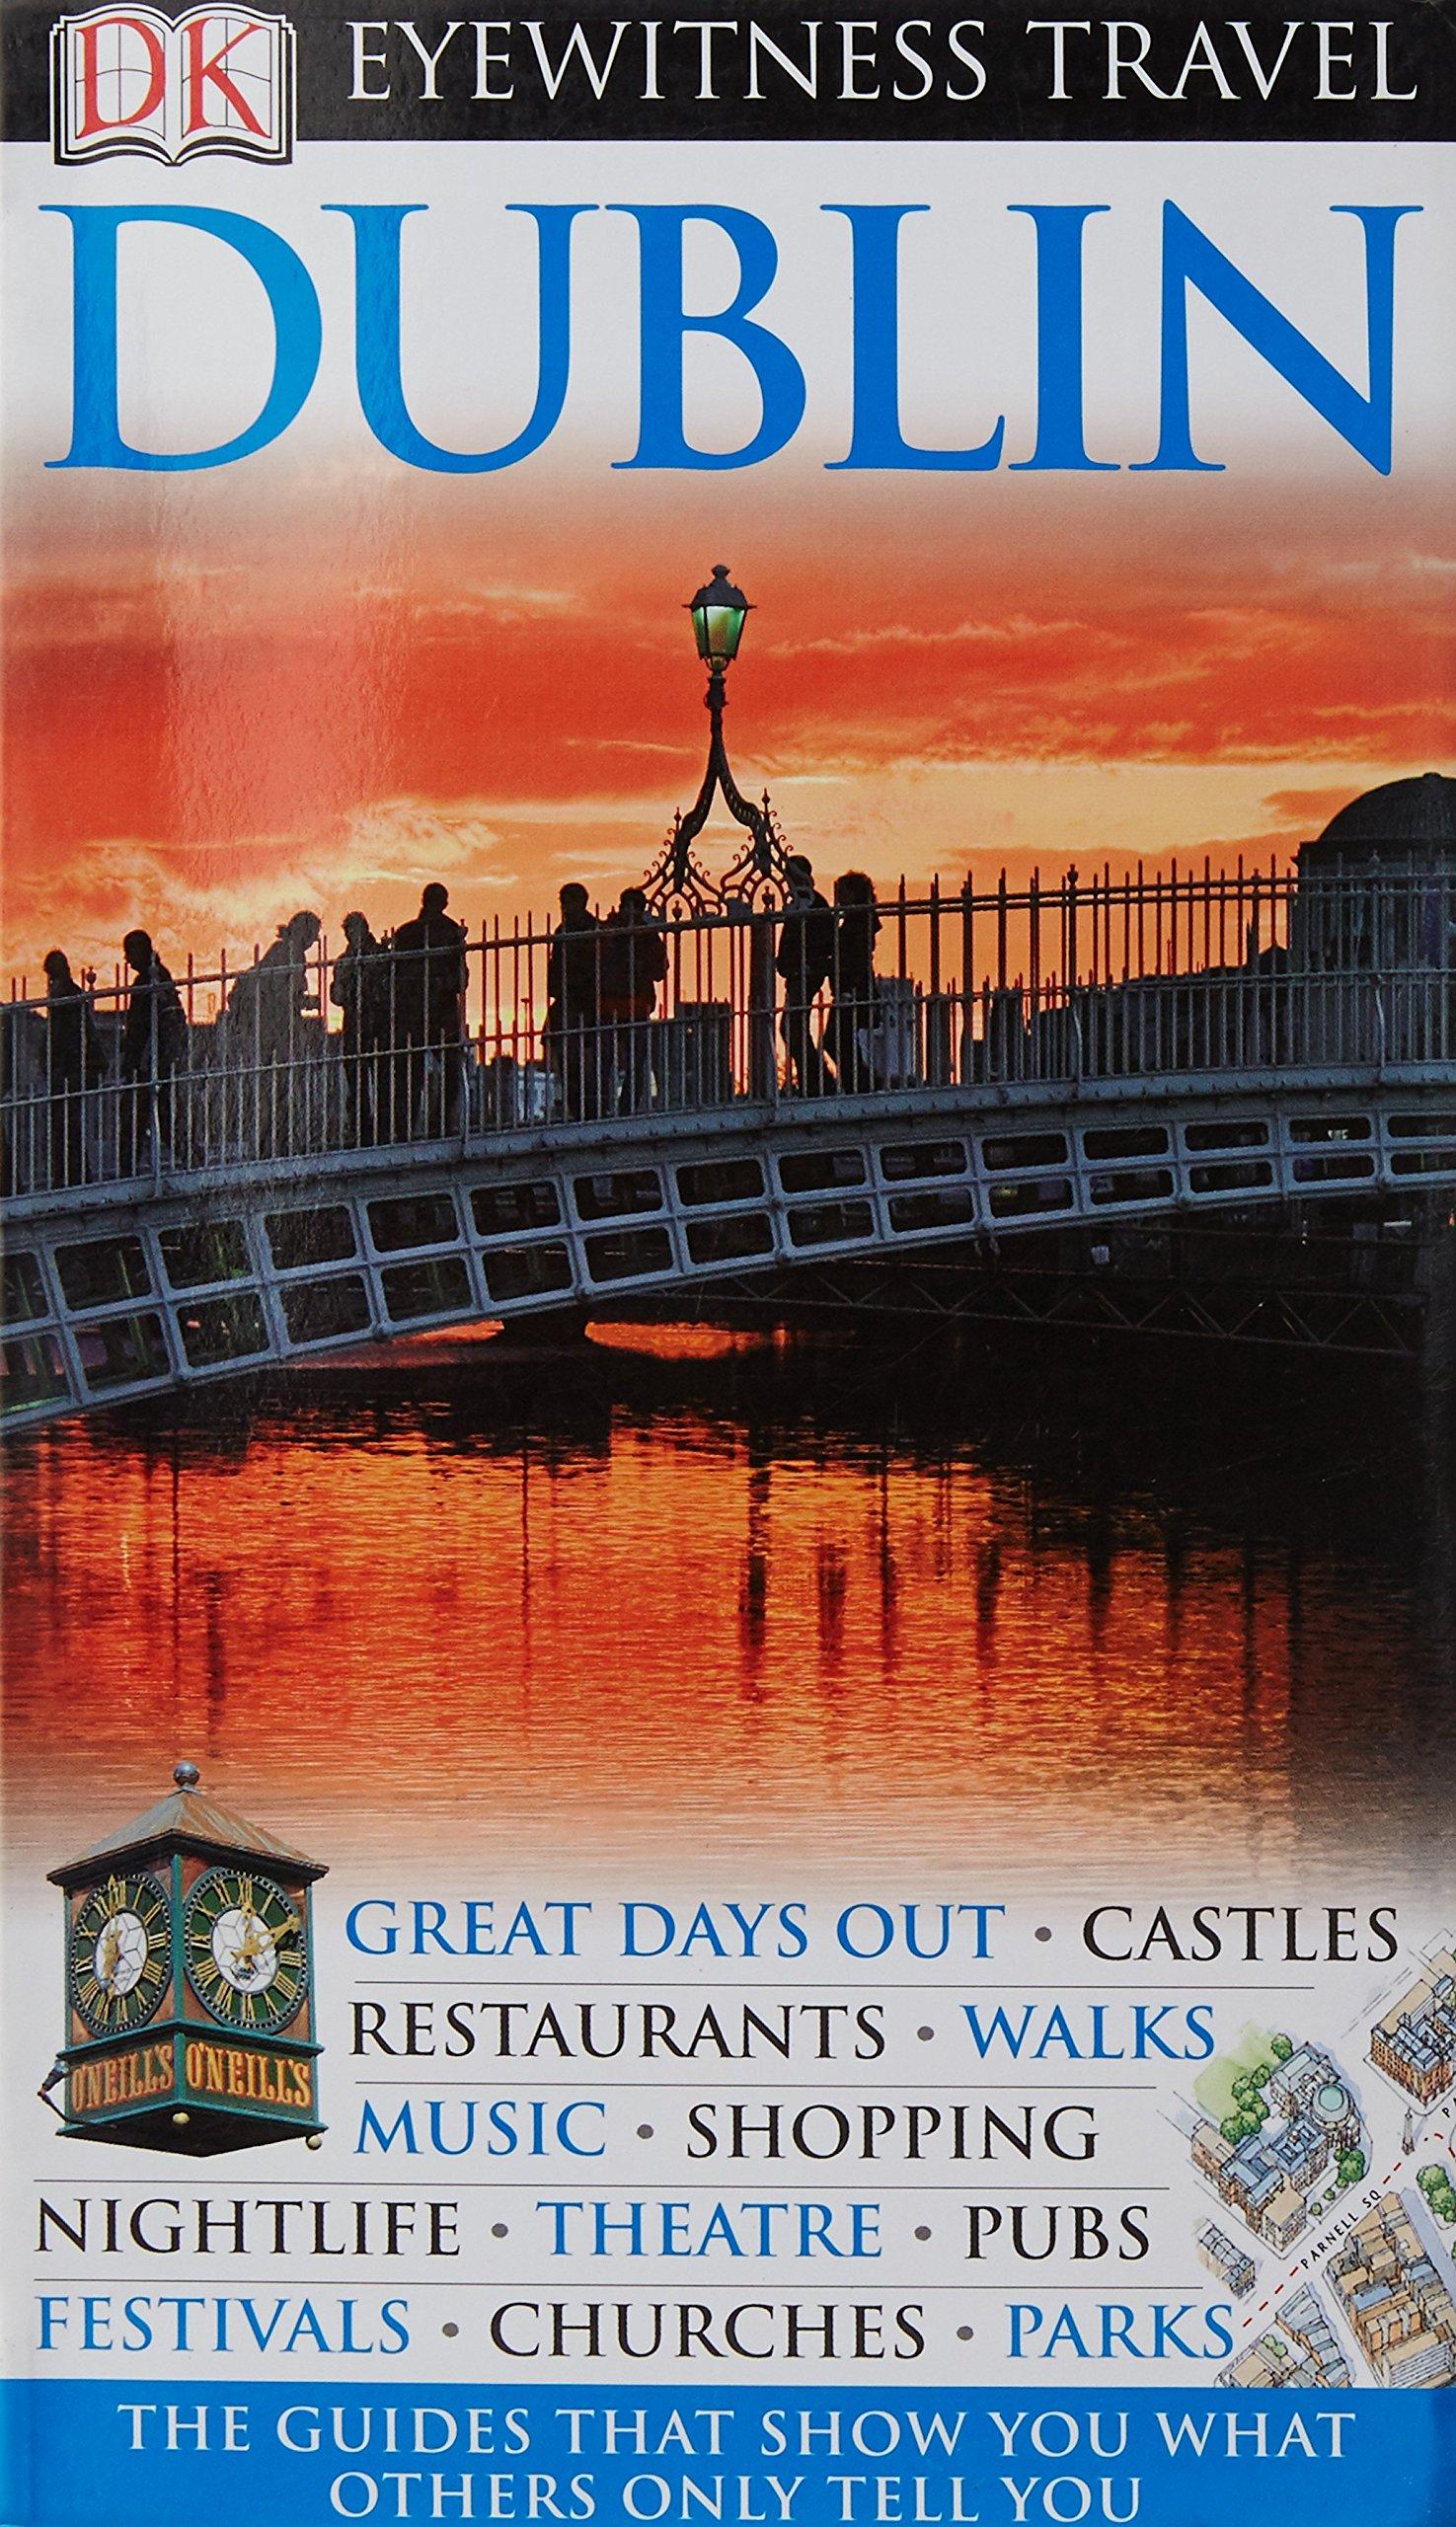 DK Eyewitness Travel Guide: Dublin: DK Publishing: 9781405346931:  Amazon.com: Books